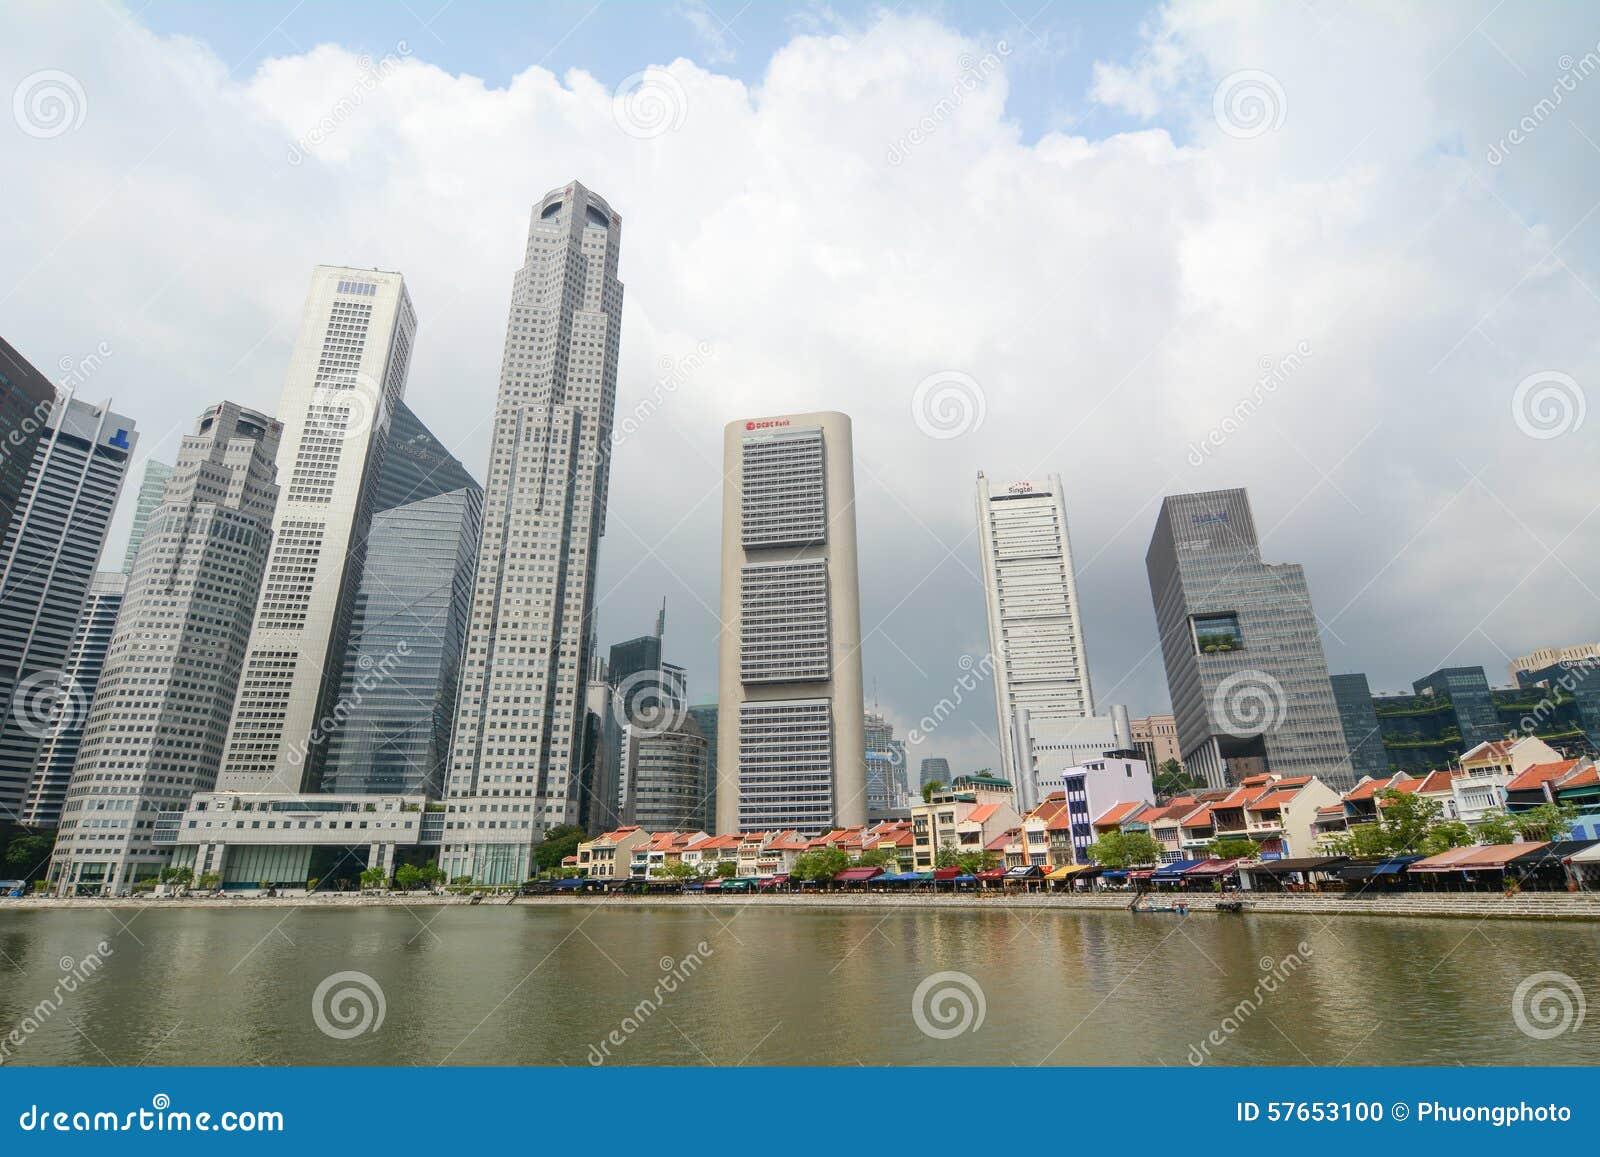 Dzielnica biznesu Singapur